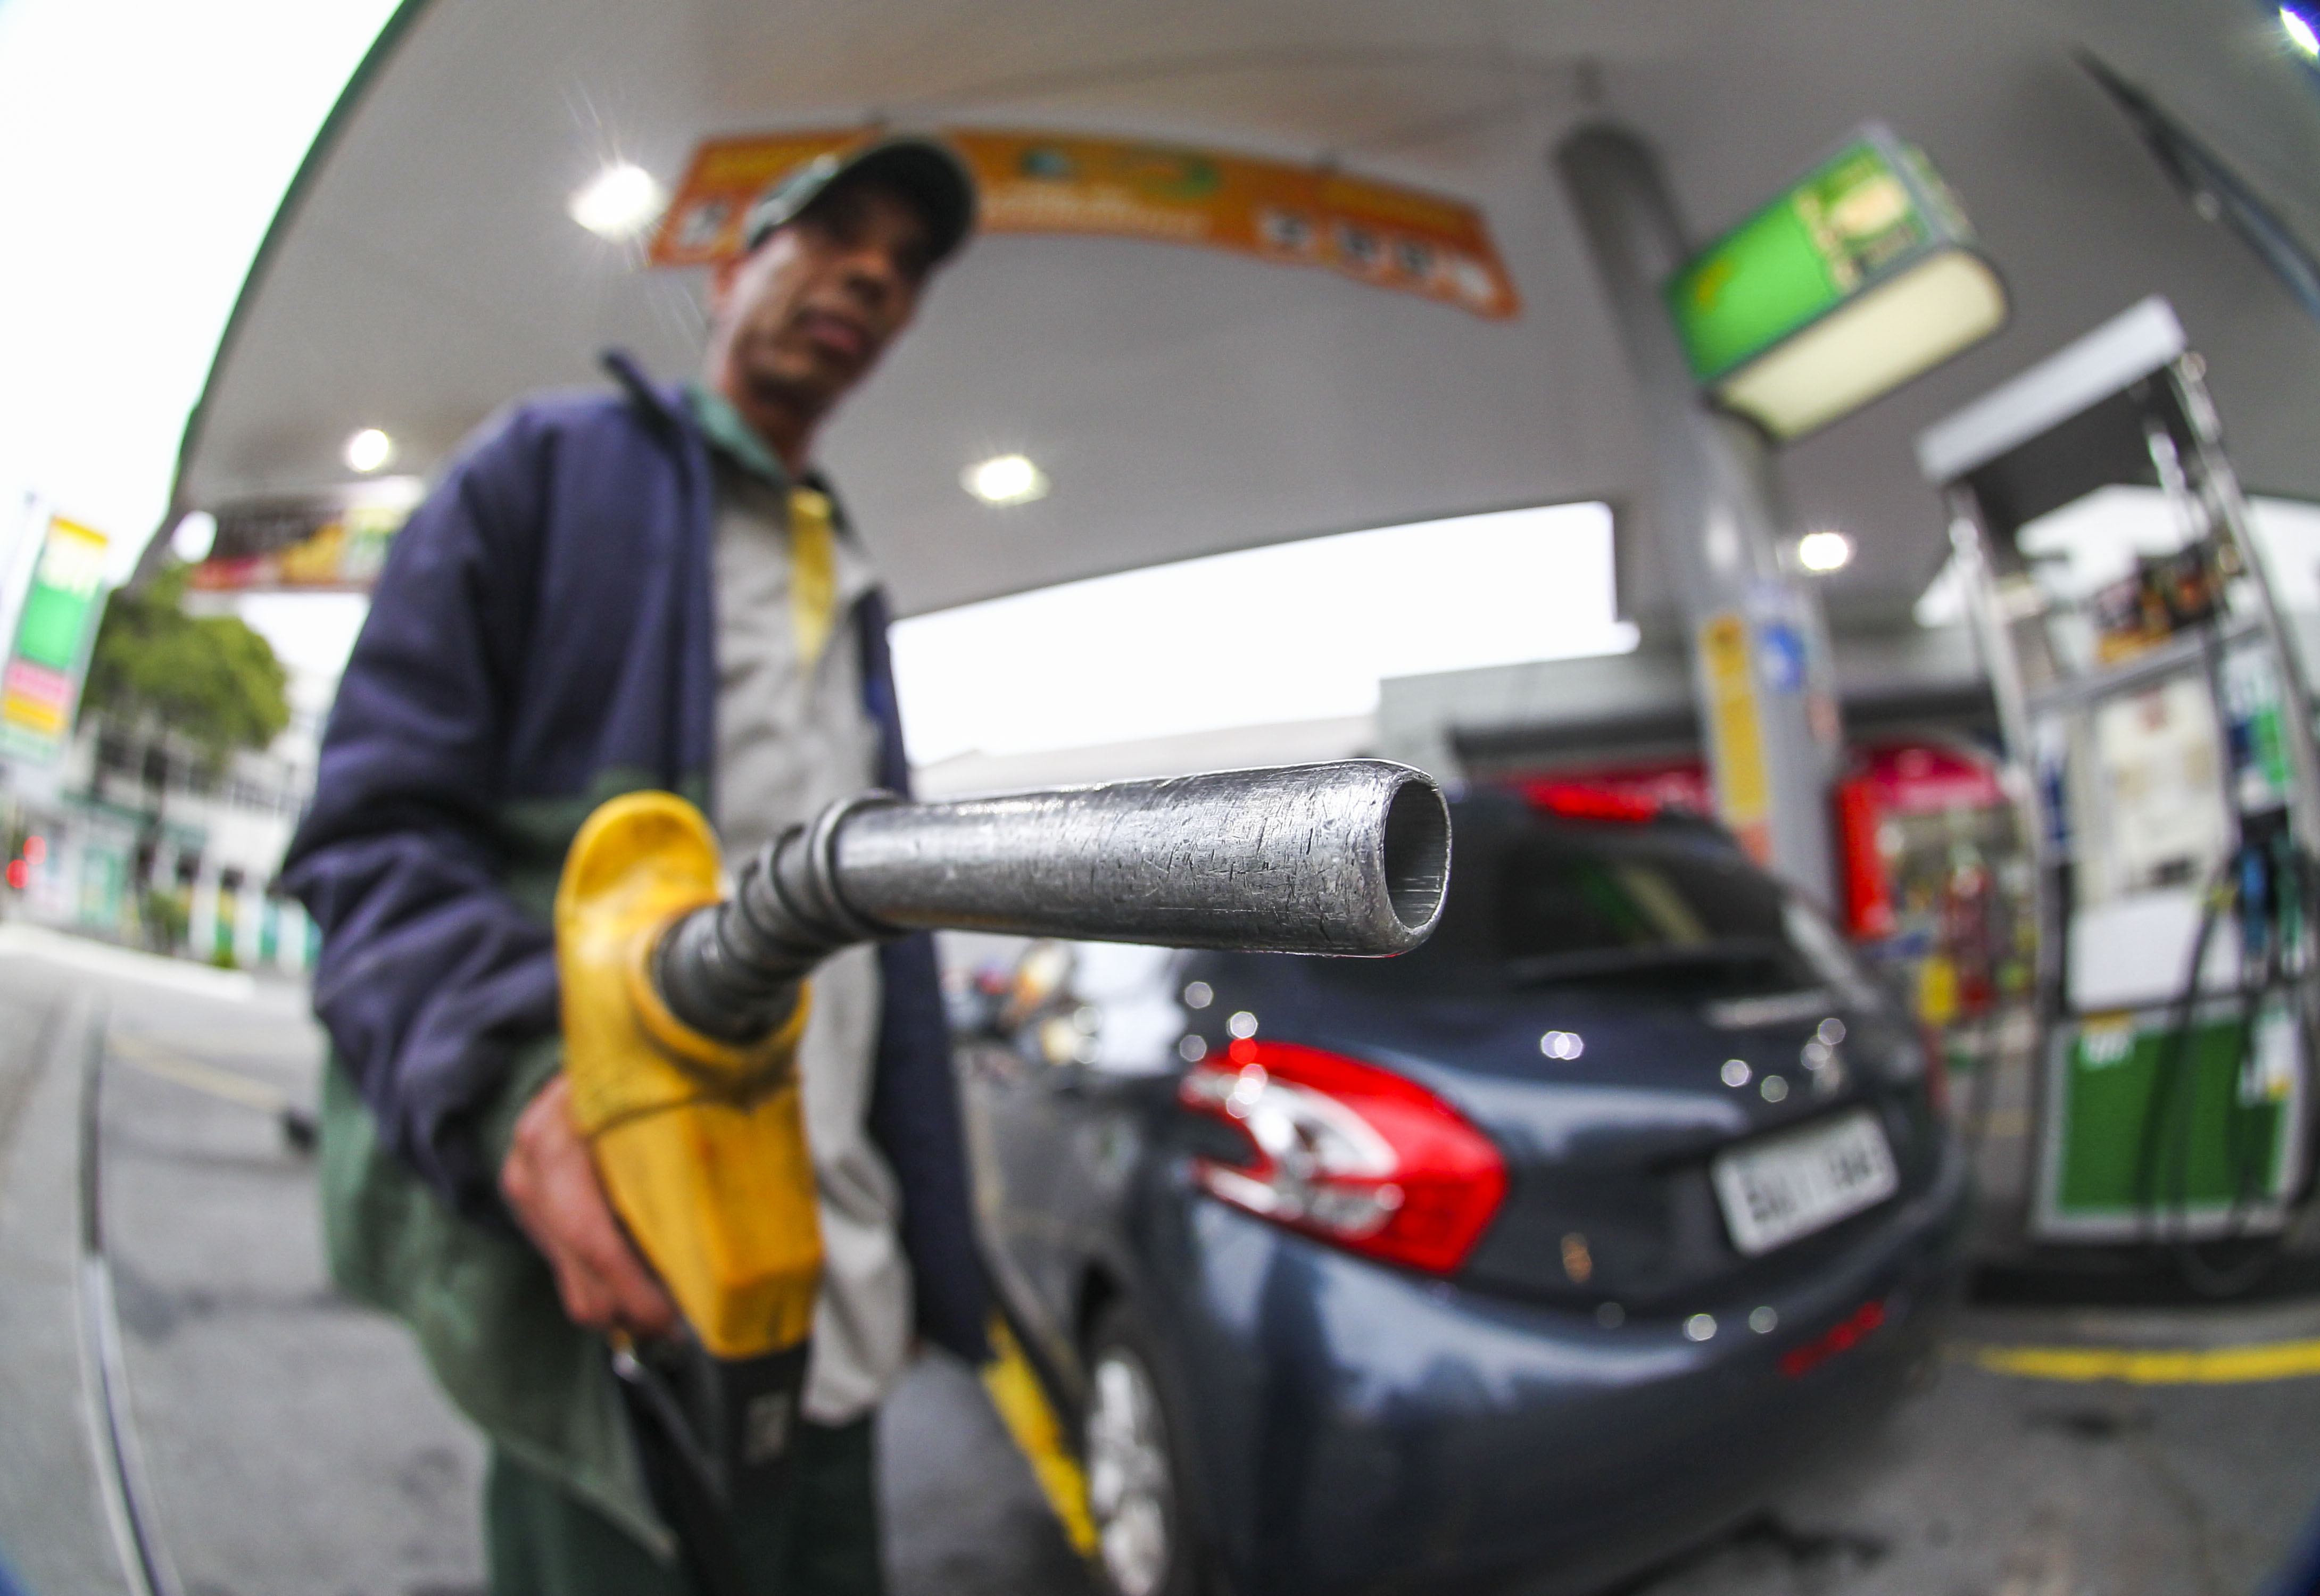 Bomba de combustível em posto. Gasolina, Diesel, Petrobras